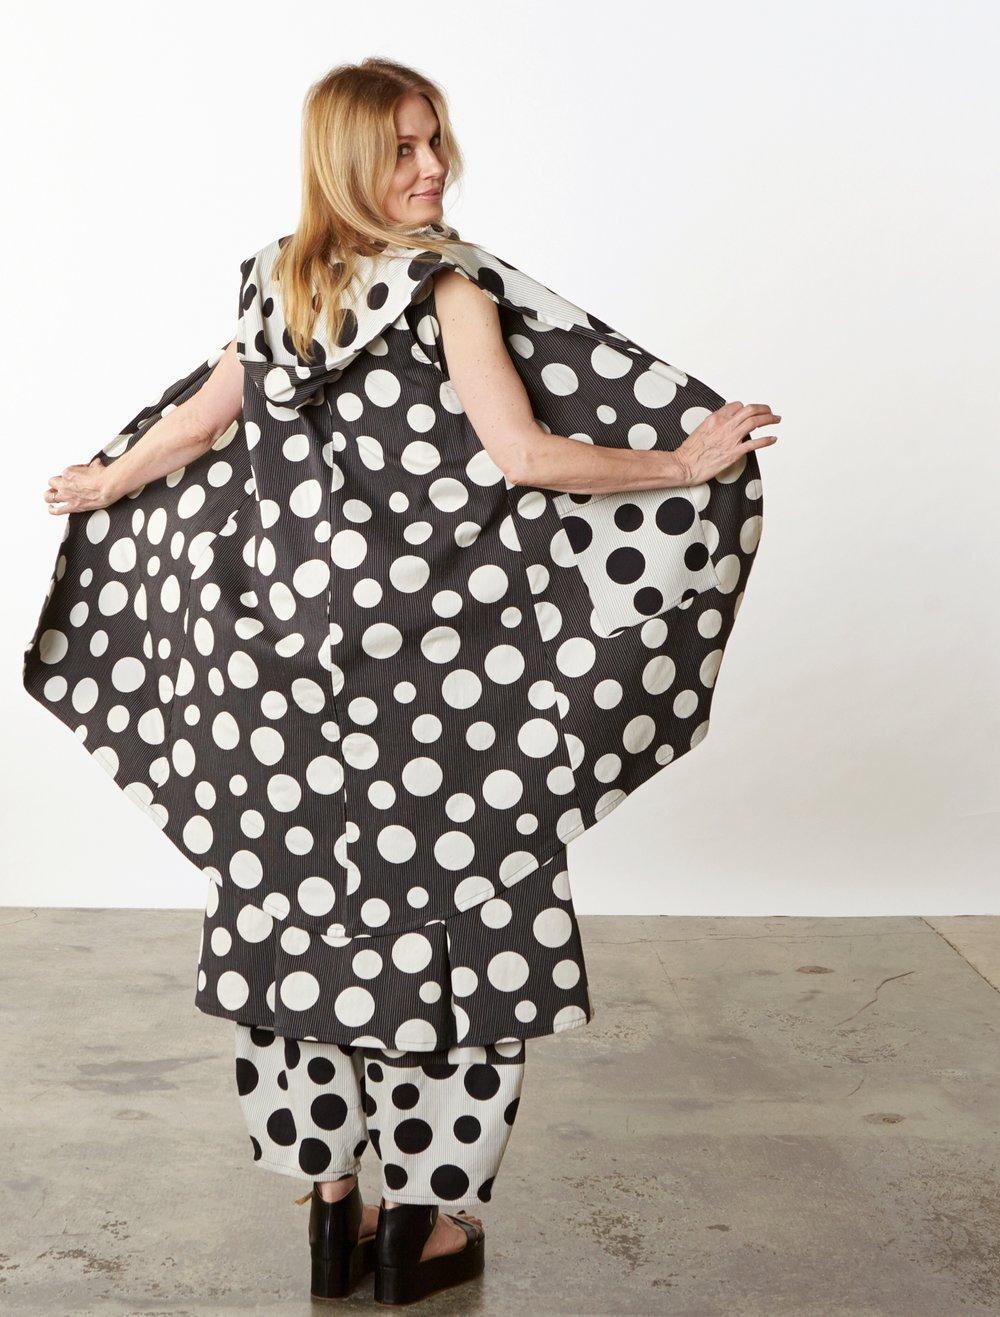 Morgen Vest, Henrietta Dress, Oliver Pant in Italian Dots & Stripes